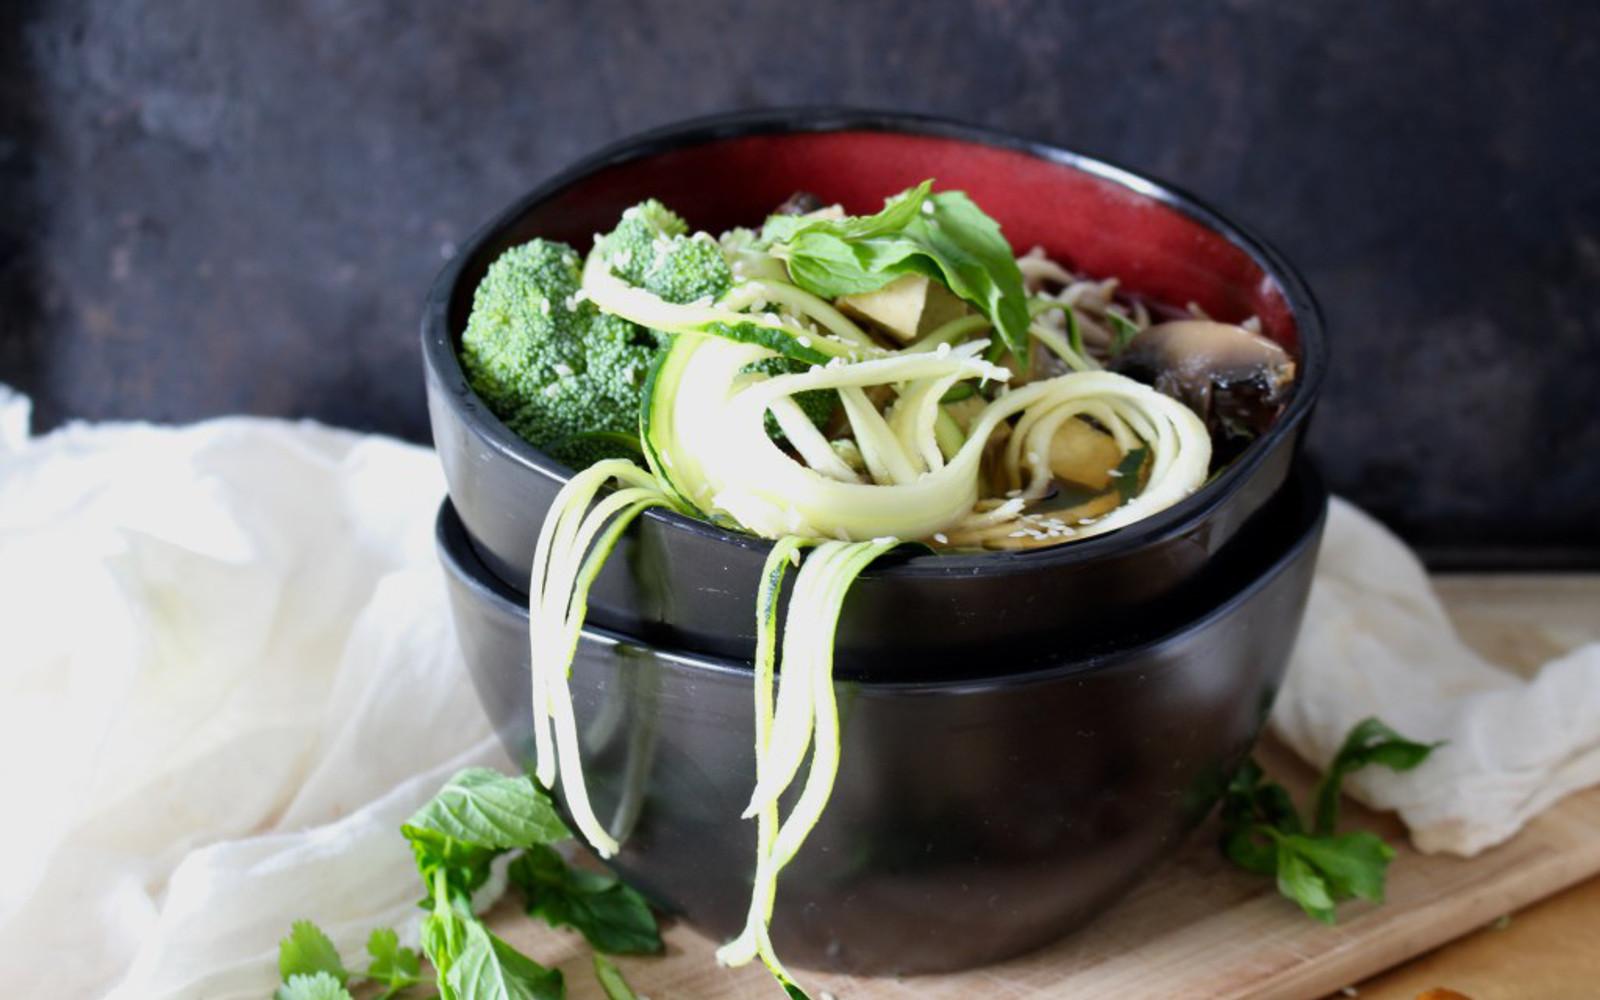 Chicken and vegetable ramen noodle soup | Healthy Recipe ...  |Ramen Noodle Broth